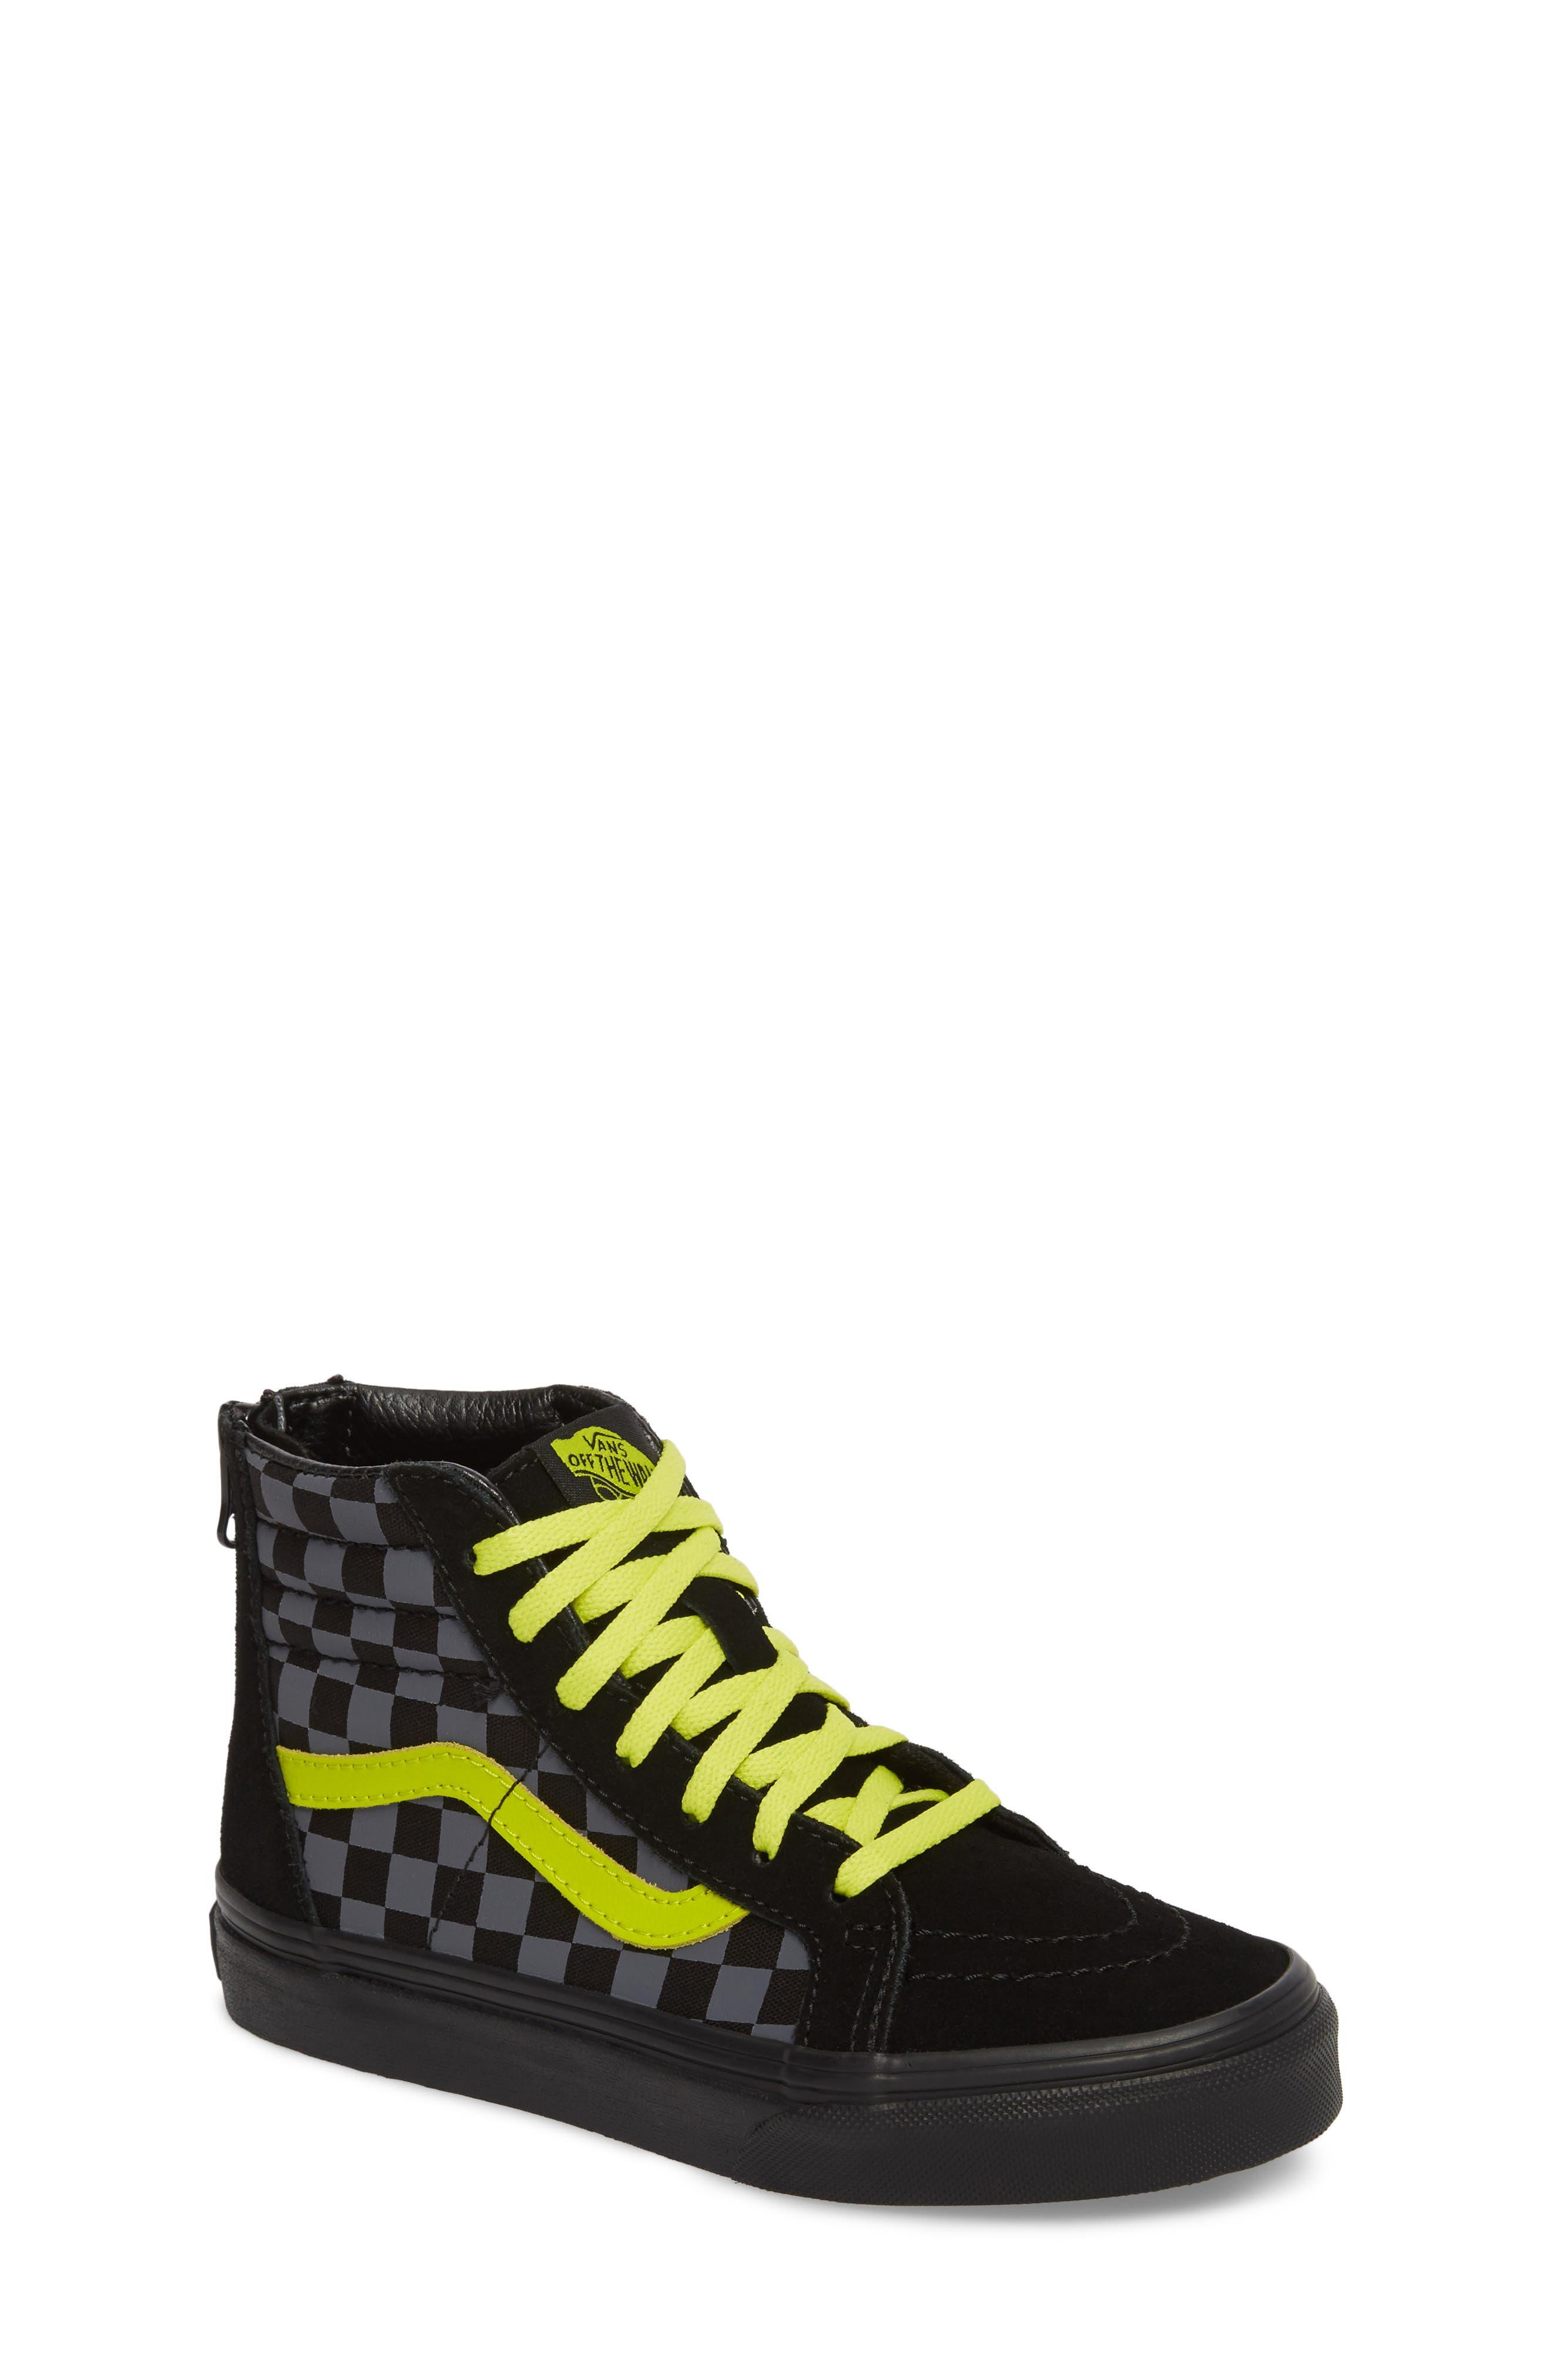 Reflective Checkerboard SK8-Hi Zip Sneaker,                         Main,                         color, Asphalt/ Reflective